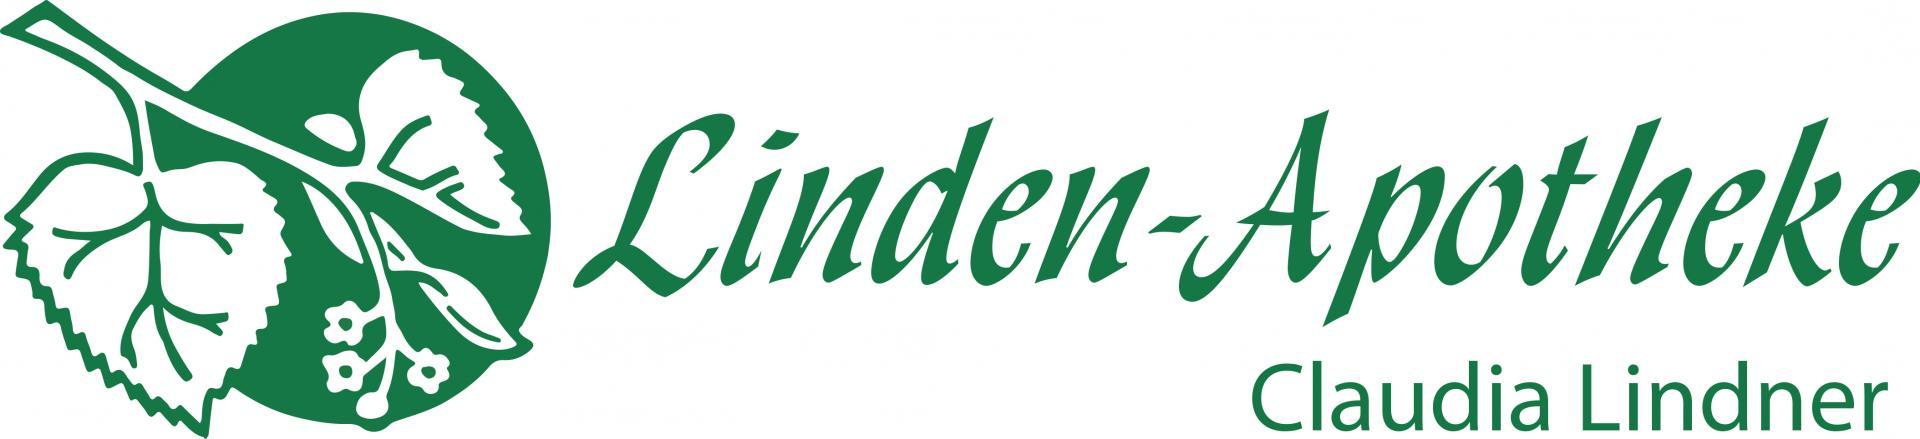 Linden Apotheke Wrestedt